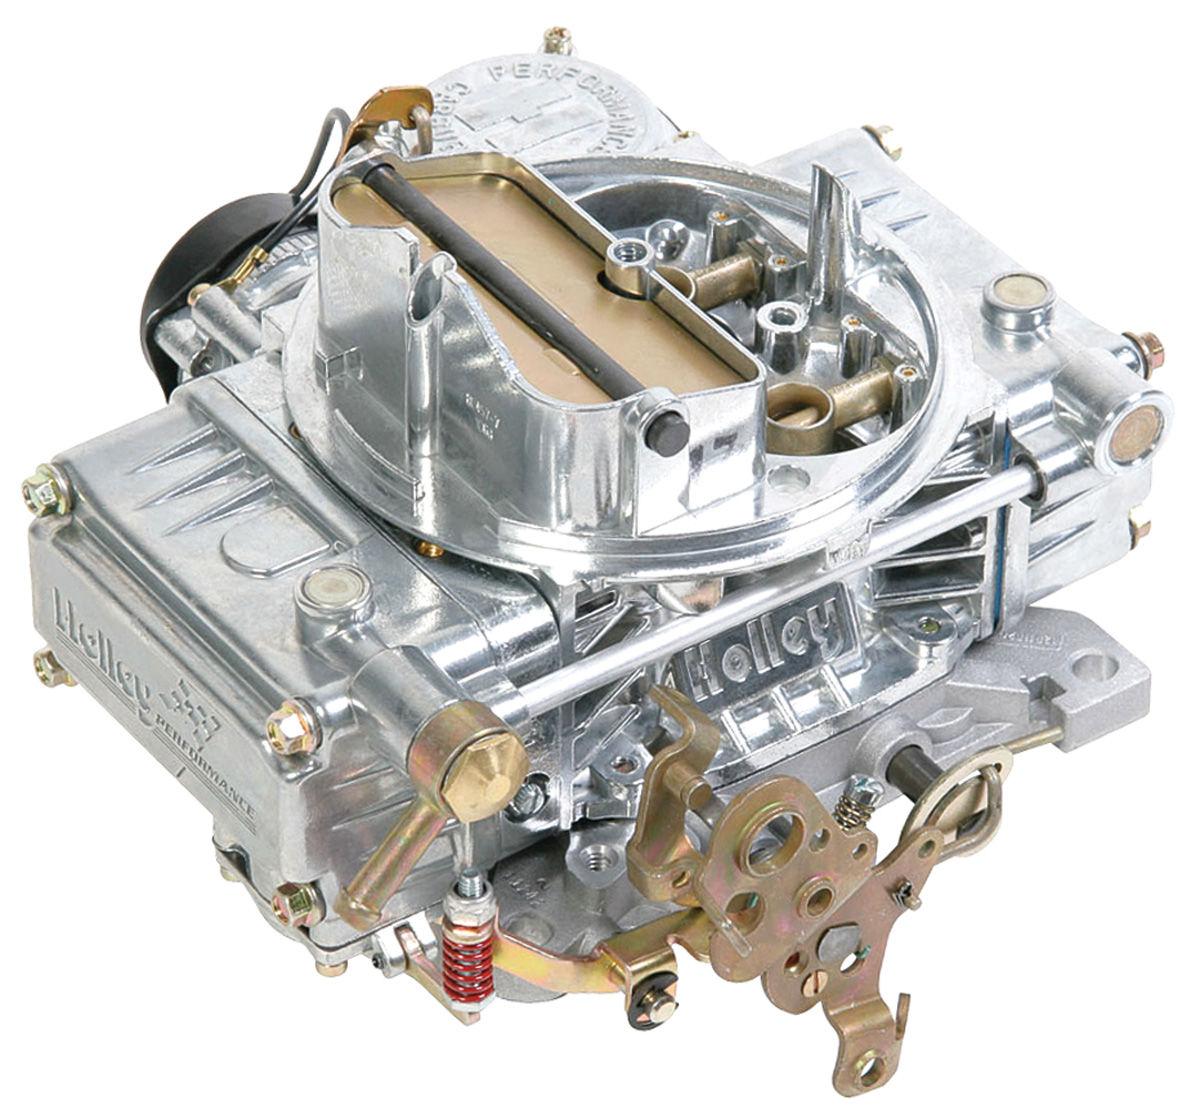 Carburetor, Holley, 600 CFM, Vac Secondary/Electric Choke